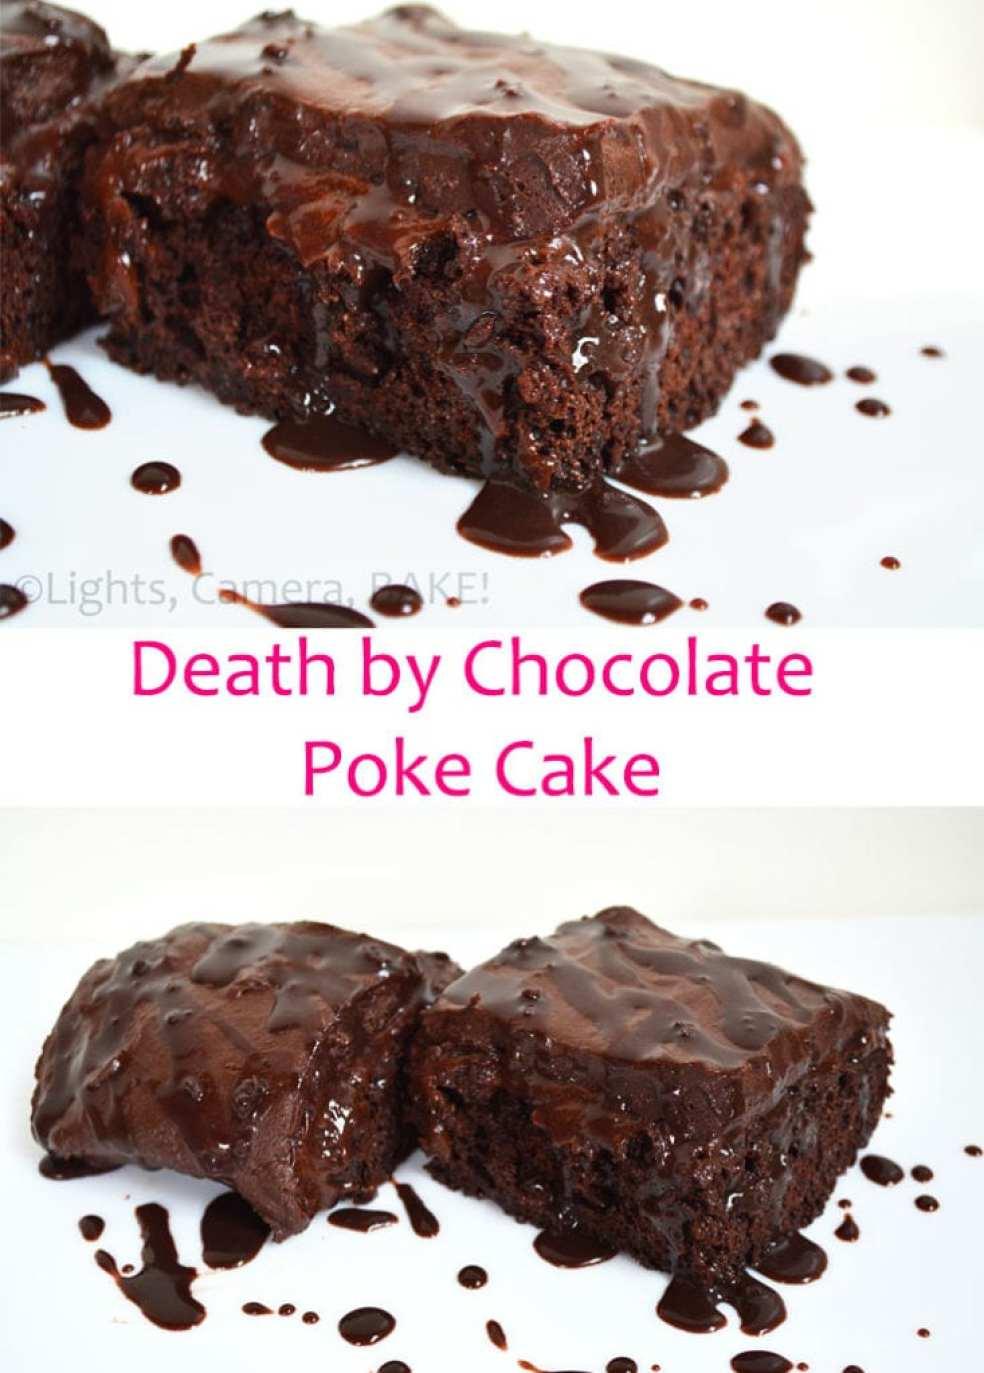 Death by Chocolate Poke Cake - Cake Week - Lights, Camera, BAKE!